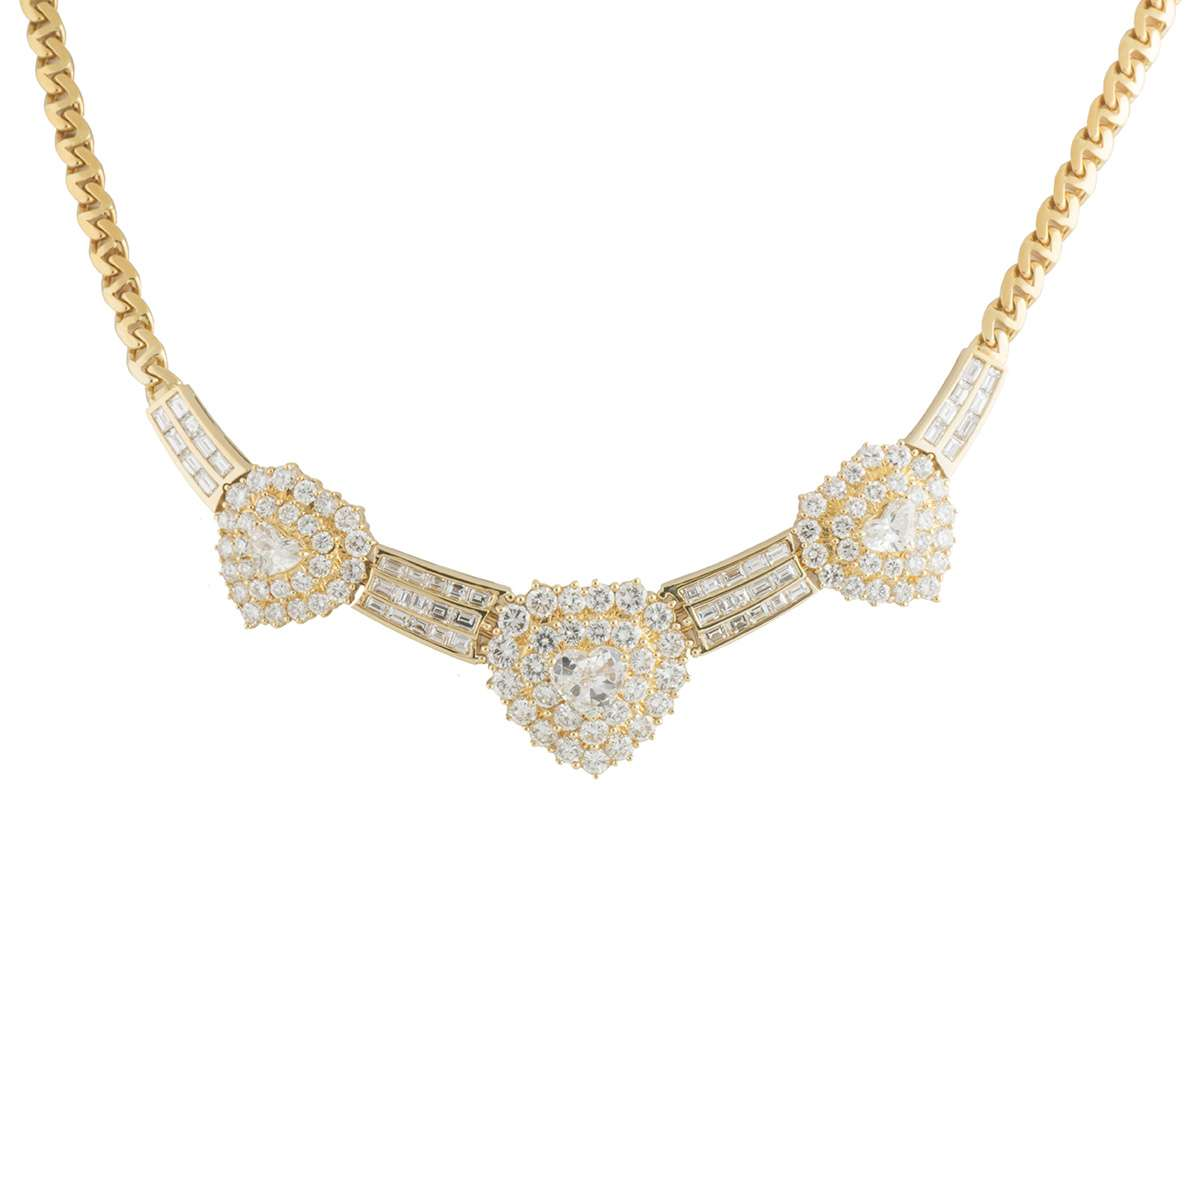 Yellow Gold Diamond Necklace 5.58ct